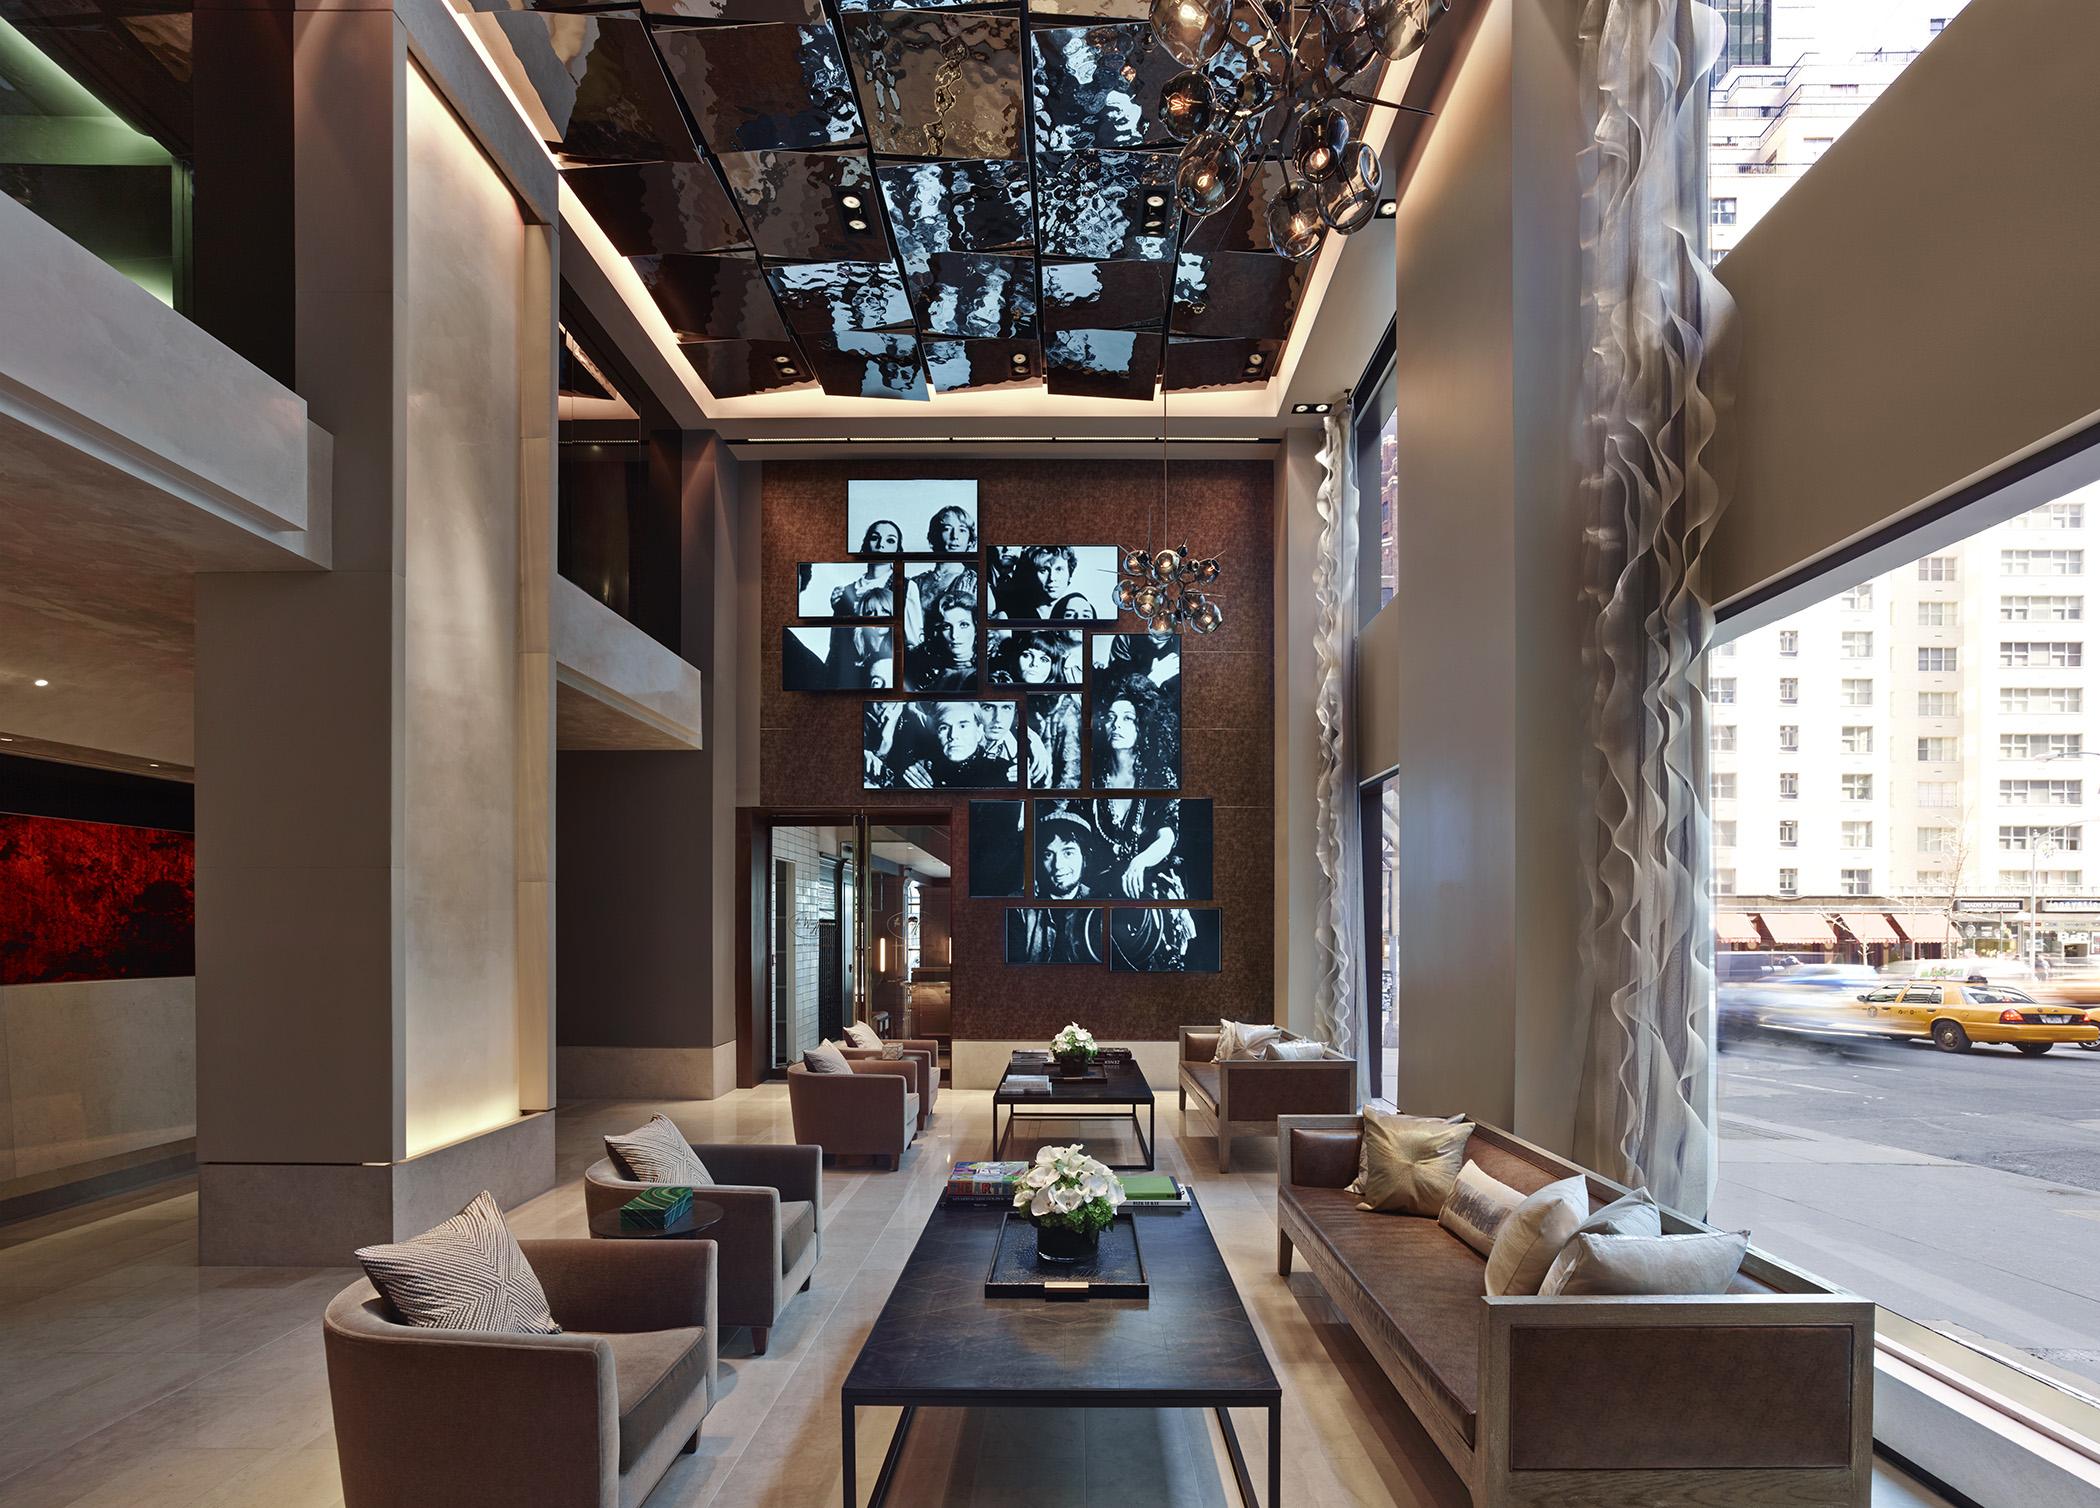 Quin Lobby_Magnum_Phillippe Halsman_Andy Warhol Group Photo.jpg